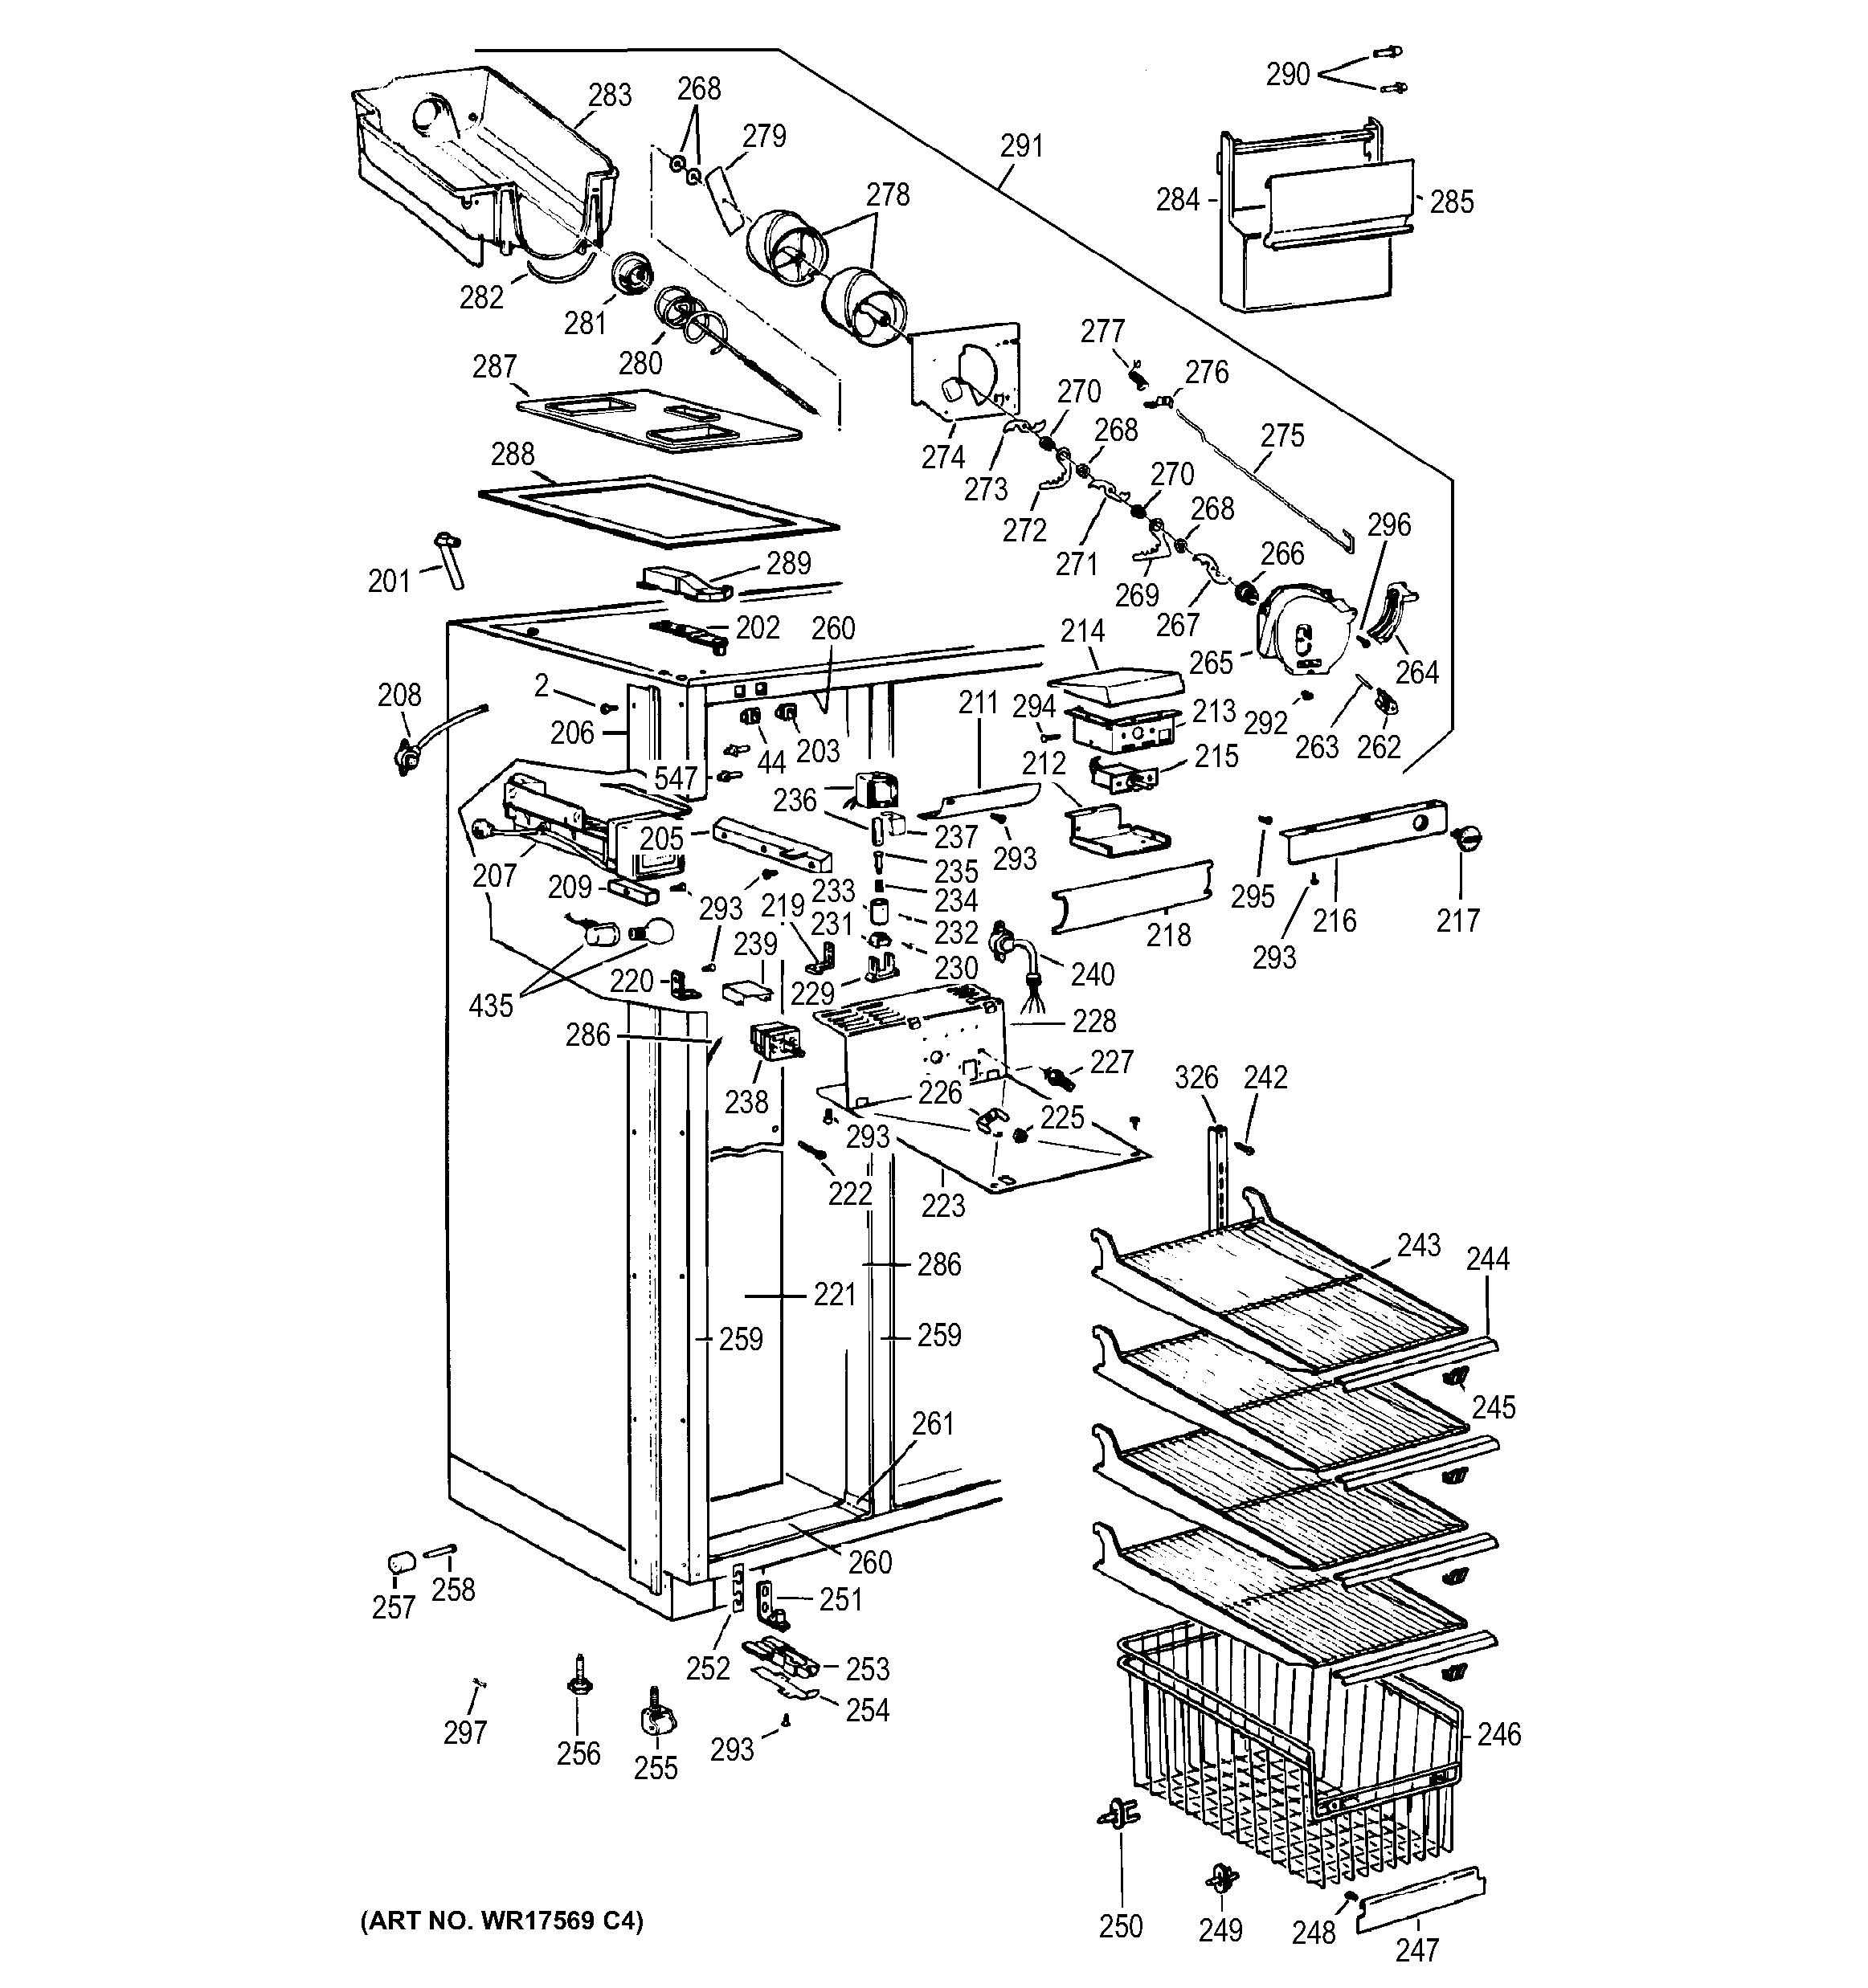 refrigerator wiring diagram compressor rv 2838  ge refrigerator schematic diagram download diagram refrigerator compressor starter wiring diagram ge refrigerator schematic diagram